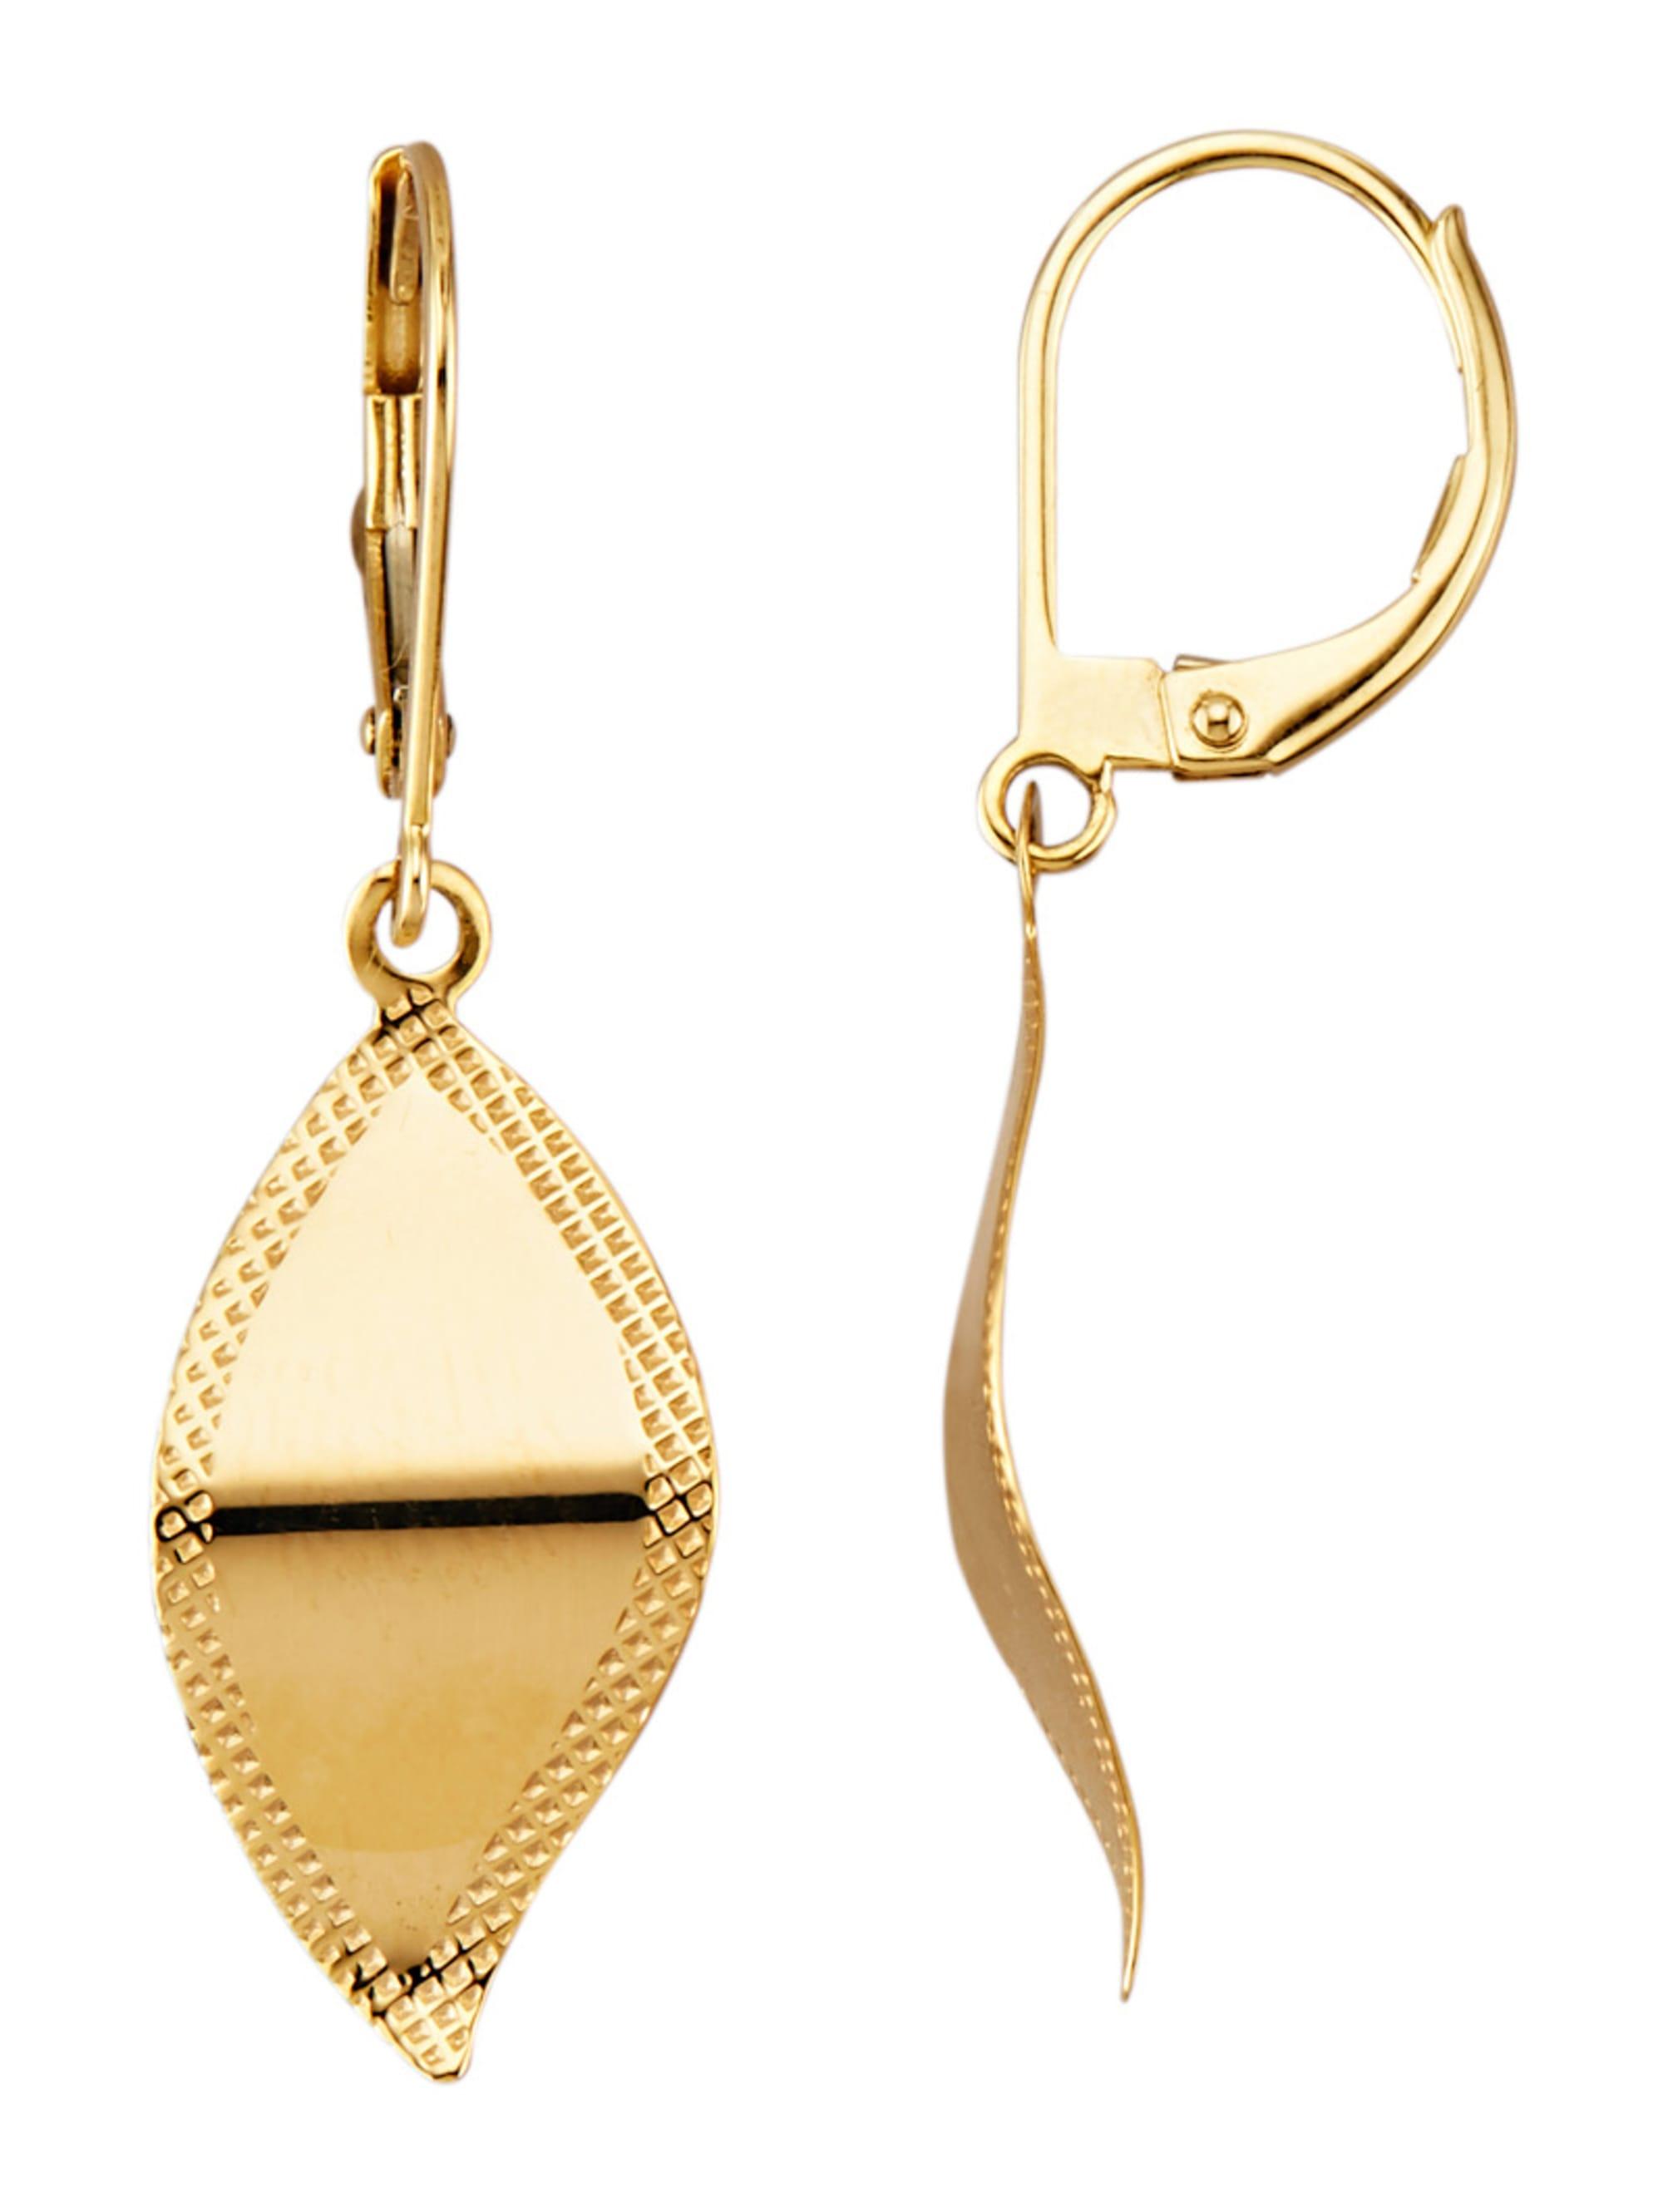 Ohrringe in Gelbgold 375 1mrEG